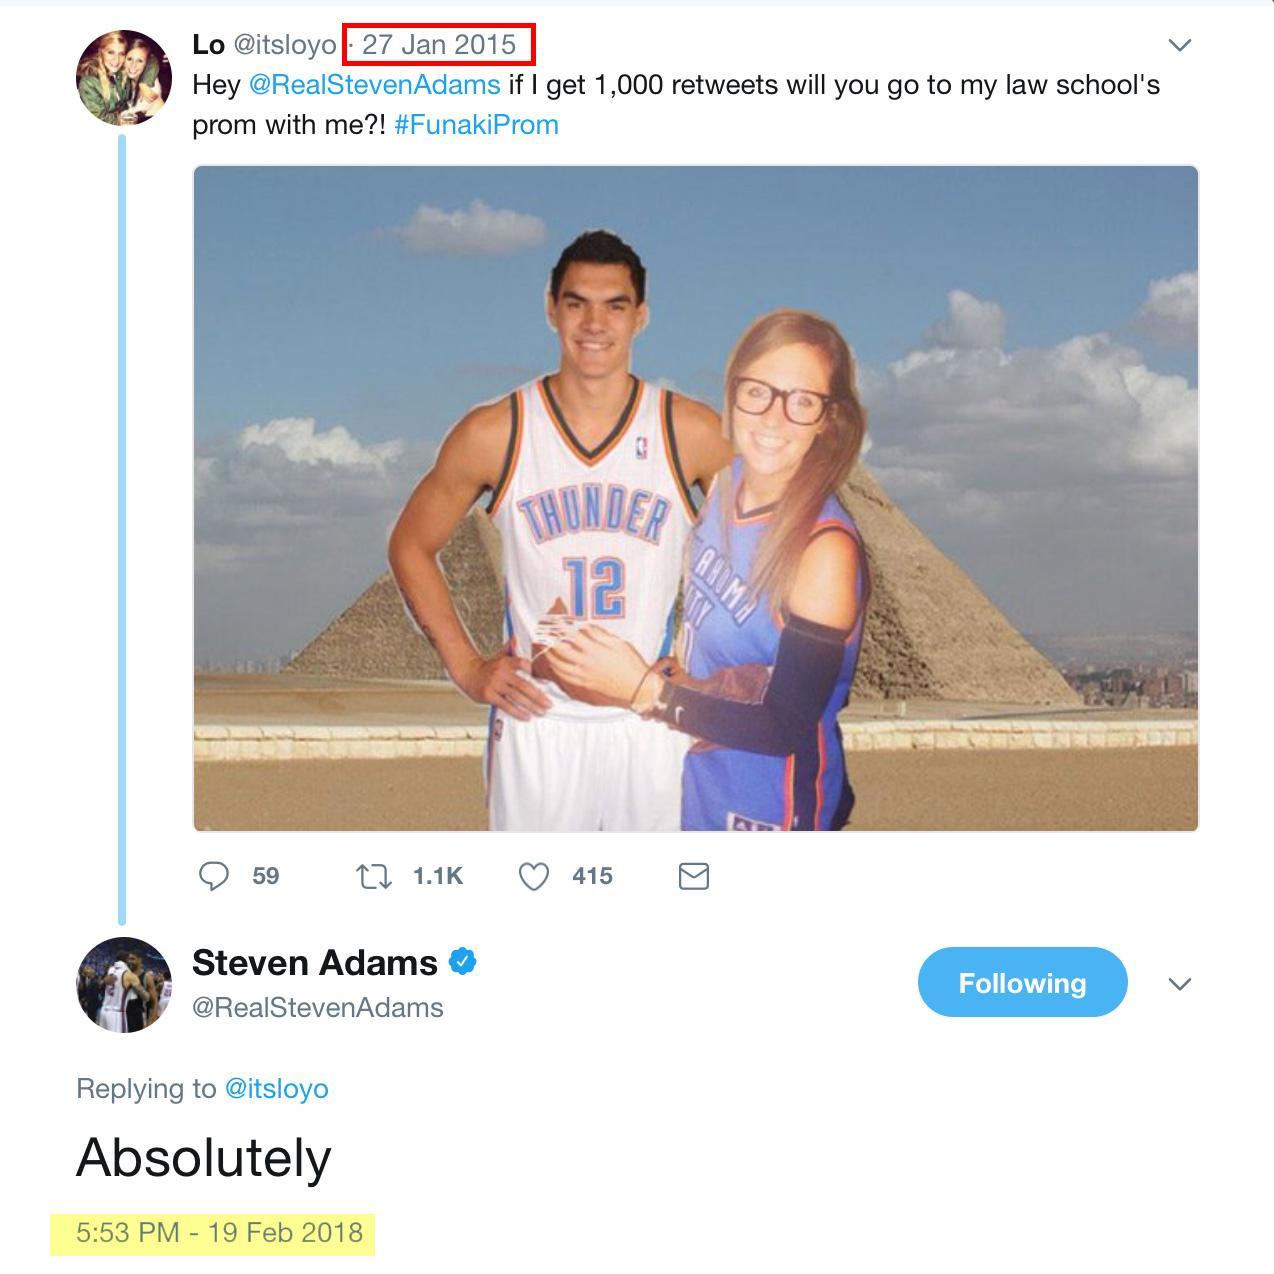 .@RealStevenAdams said yes ... 3 years later �� https://t.co/LULXrYX5u1